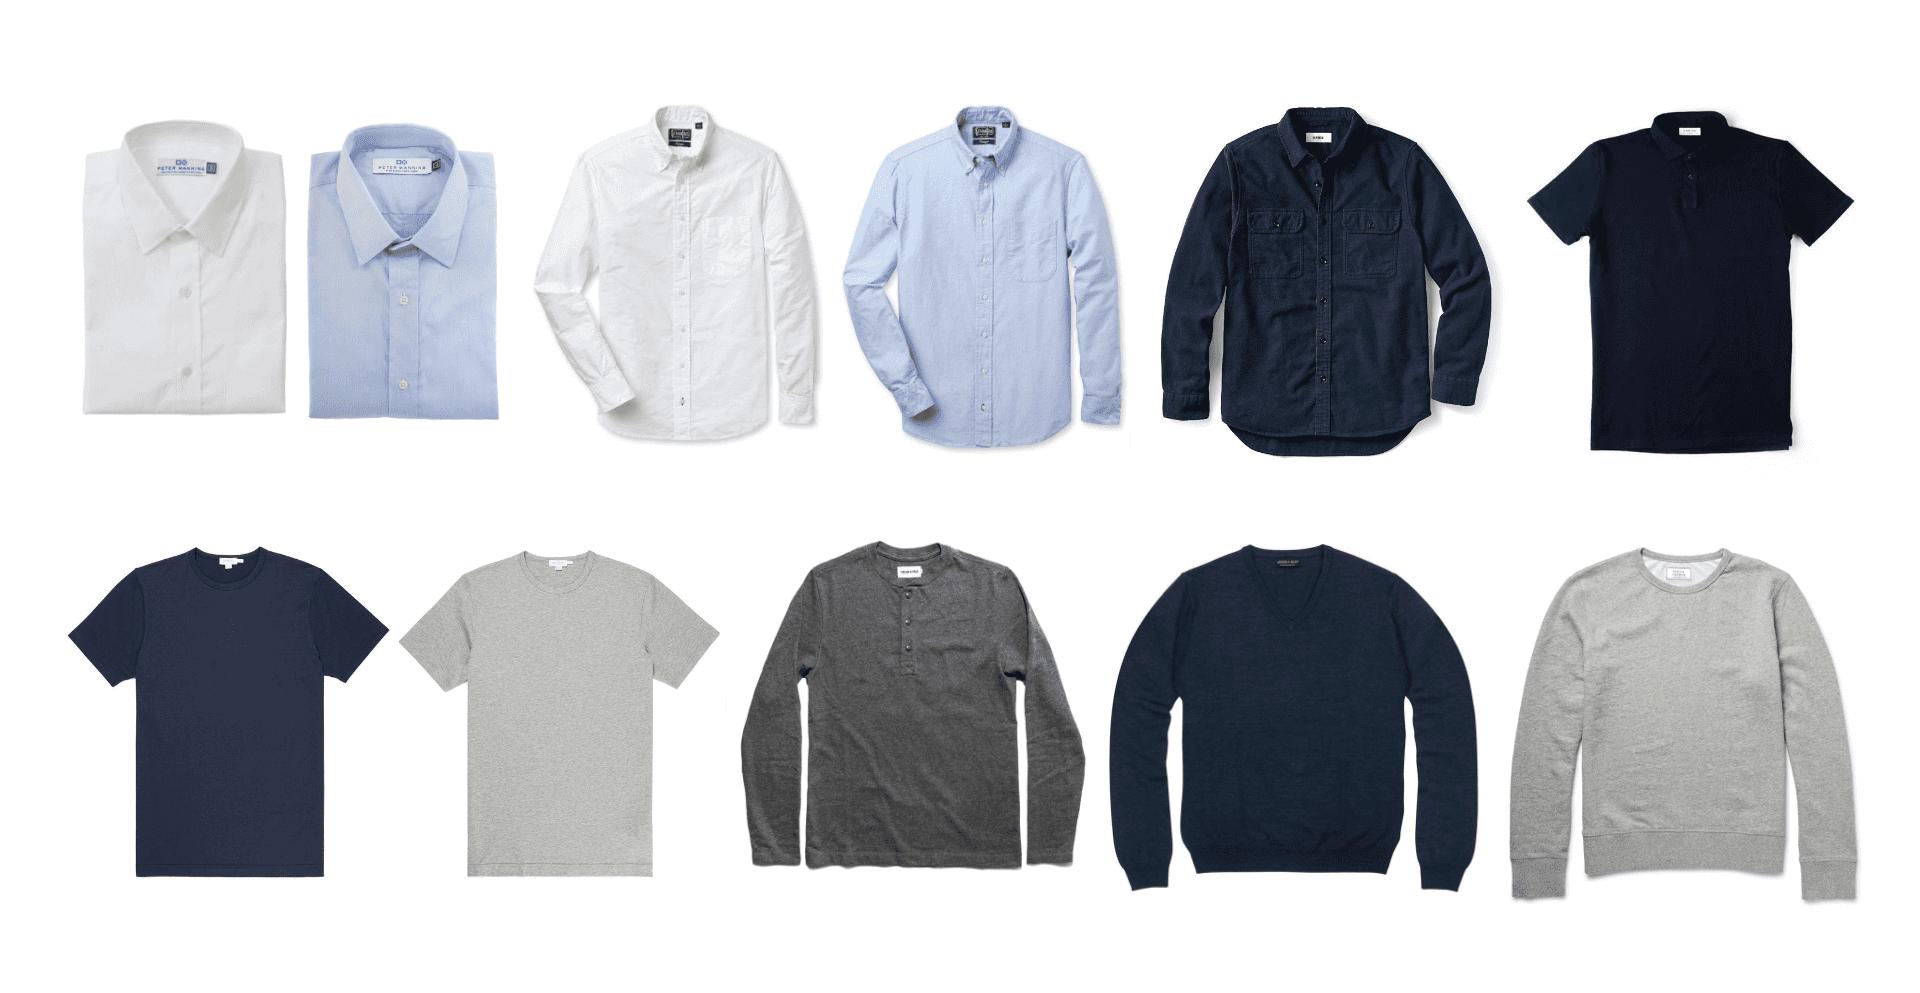 Minimal mens shirt collection